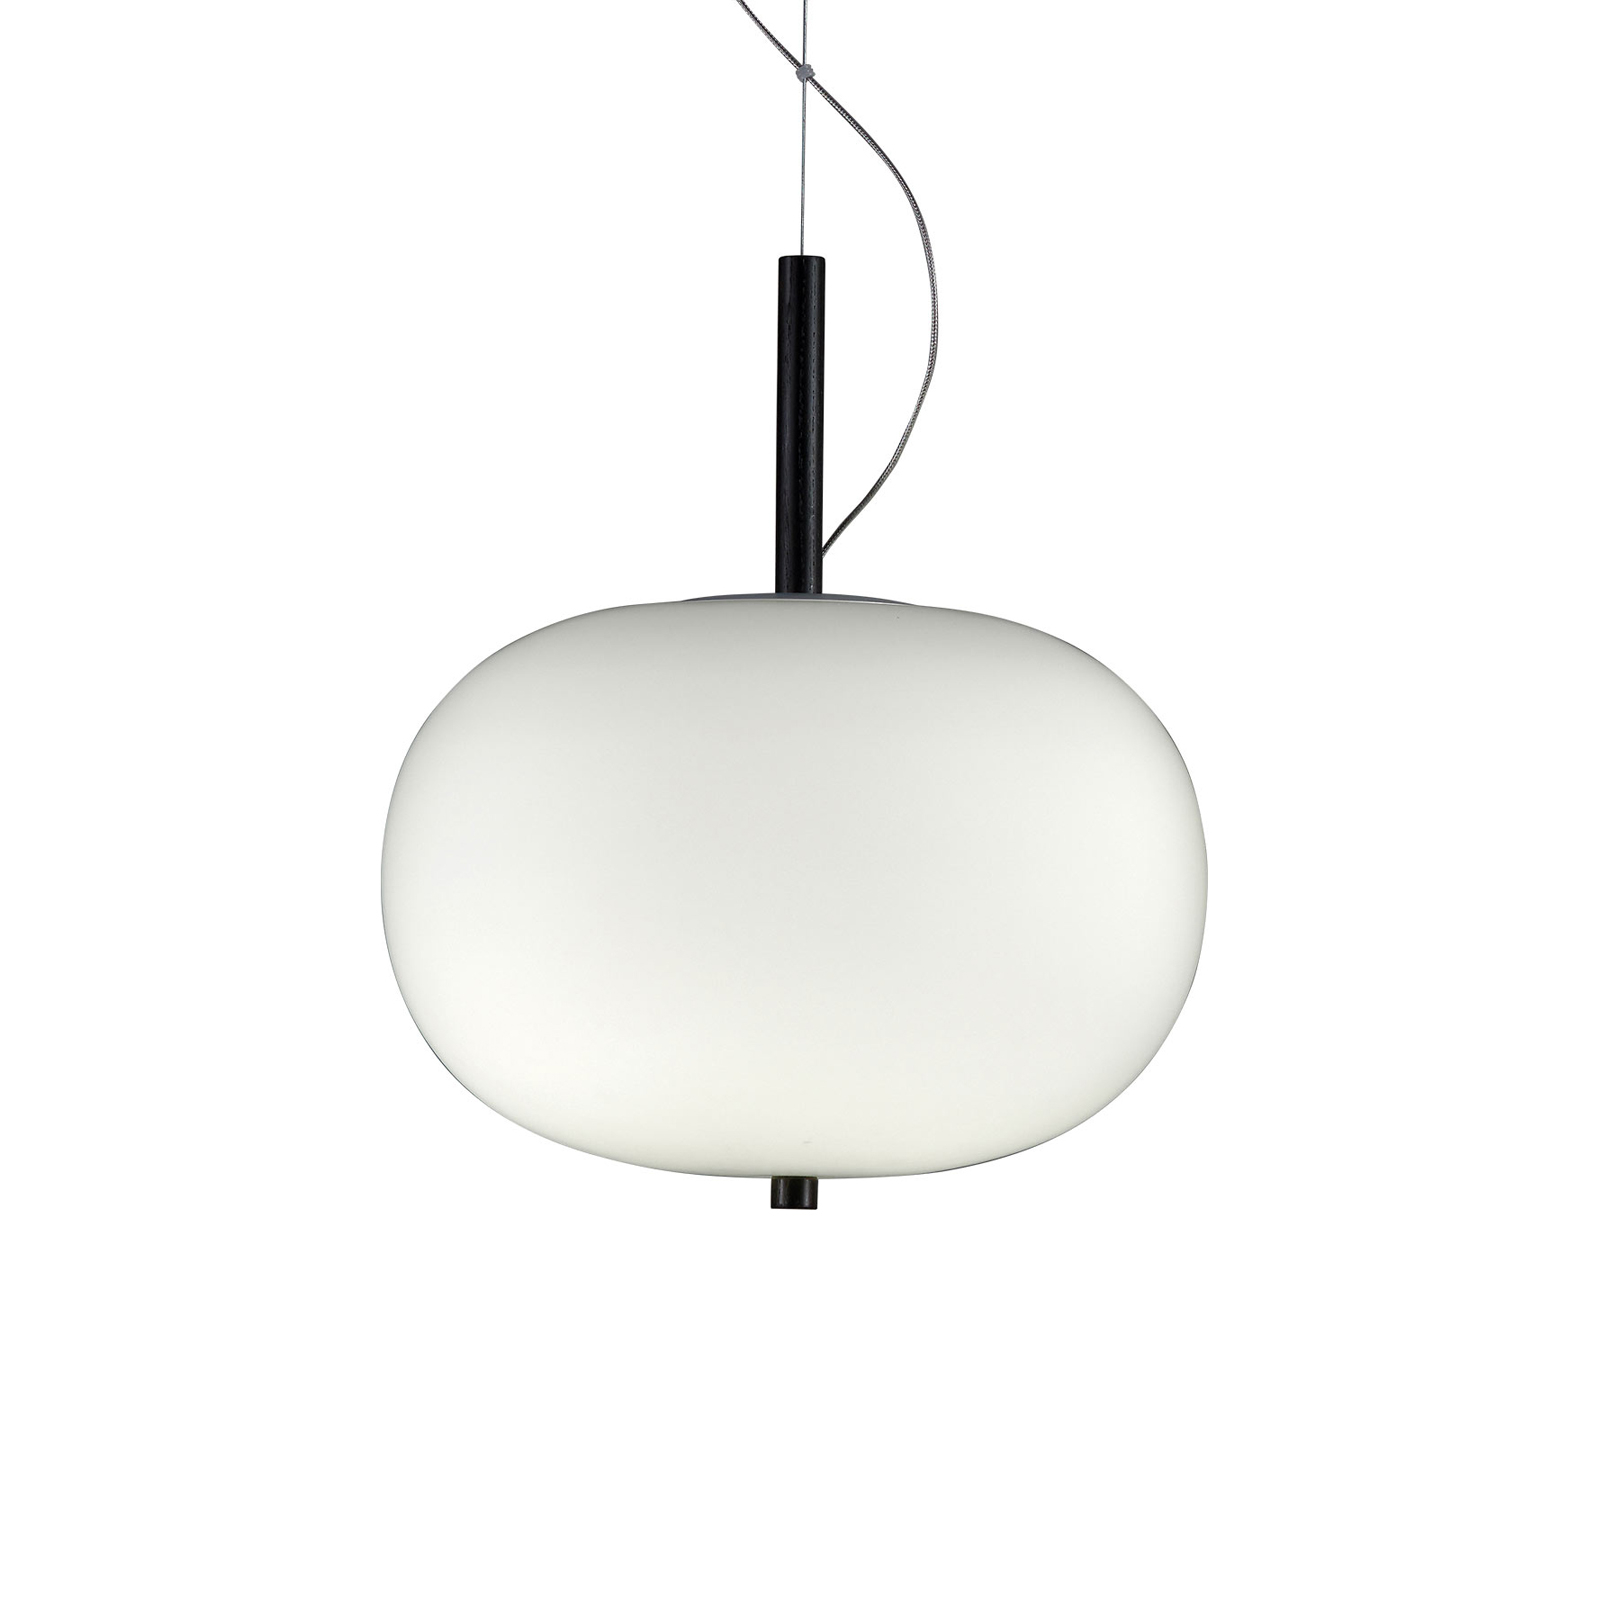 Grok Ilargi LED-Hängelampe Phase dunkel Ø 24 cm